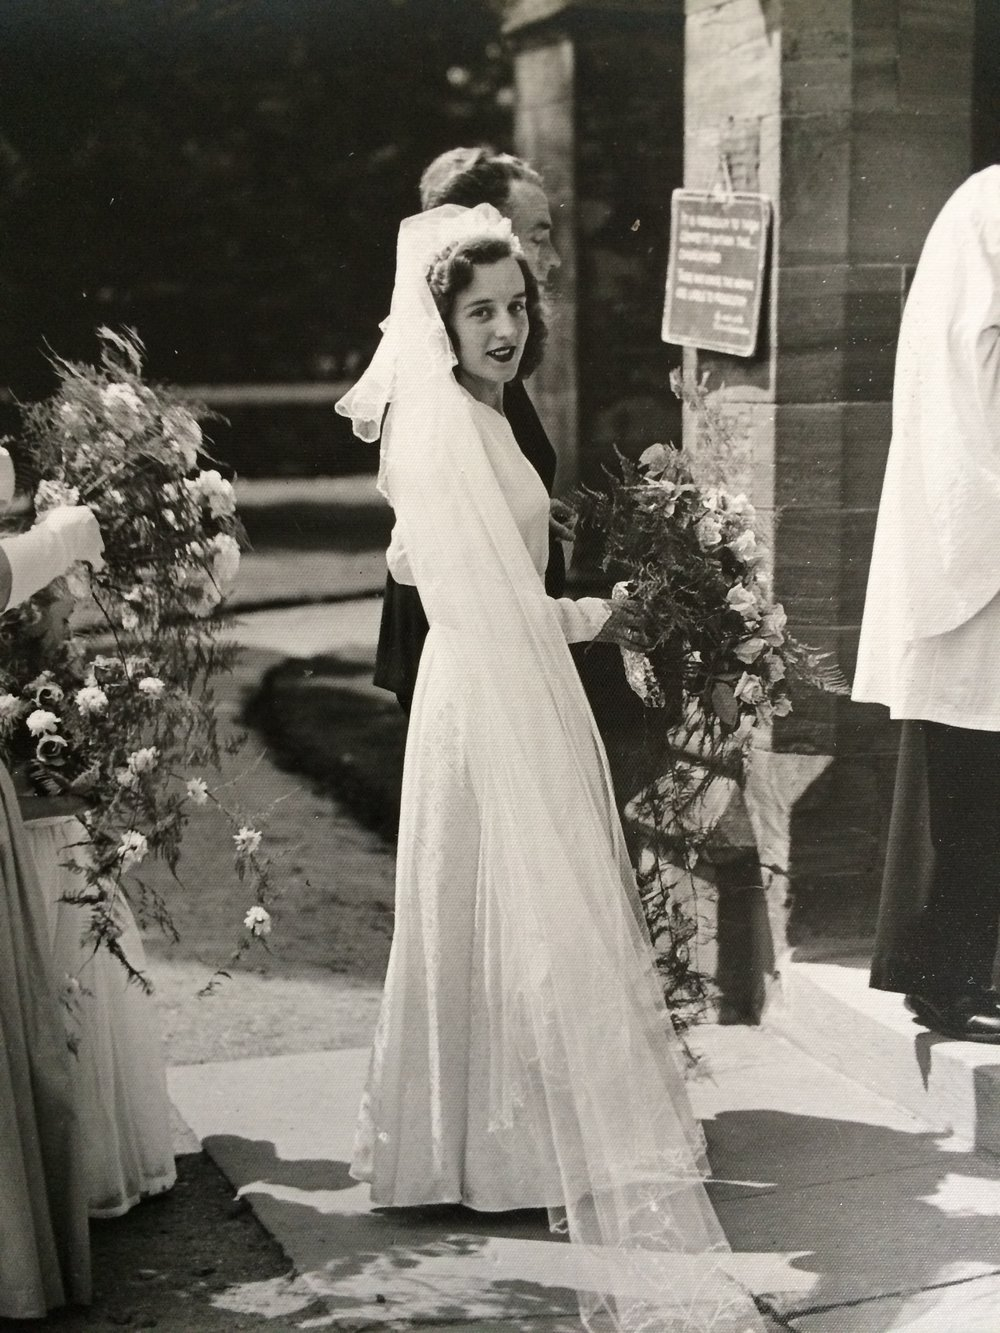 Her Grandmother's Wedding Dress | Wedding Blog